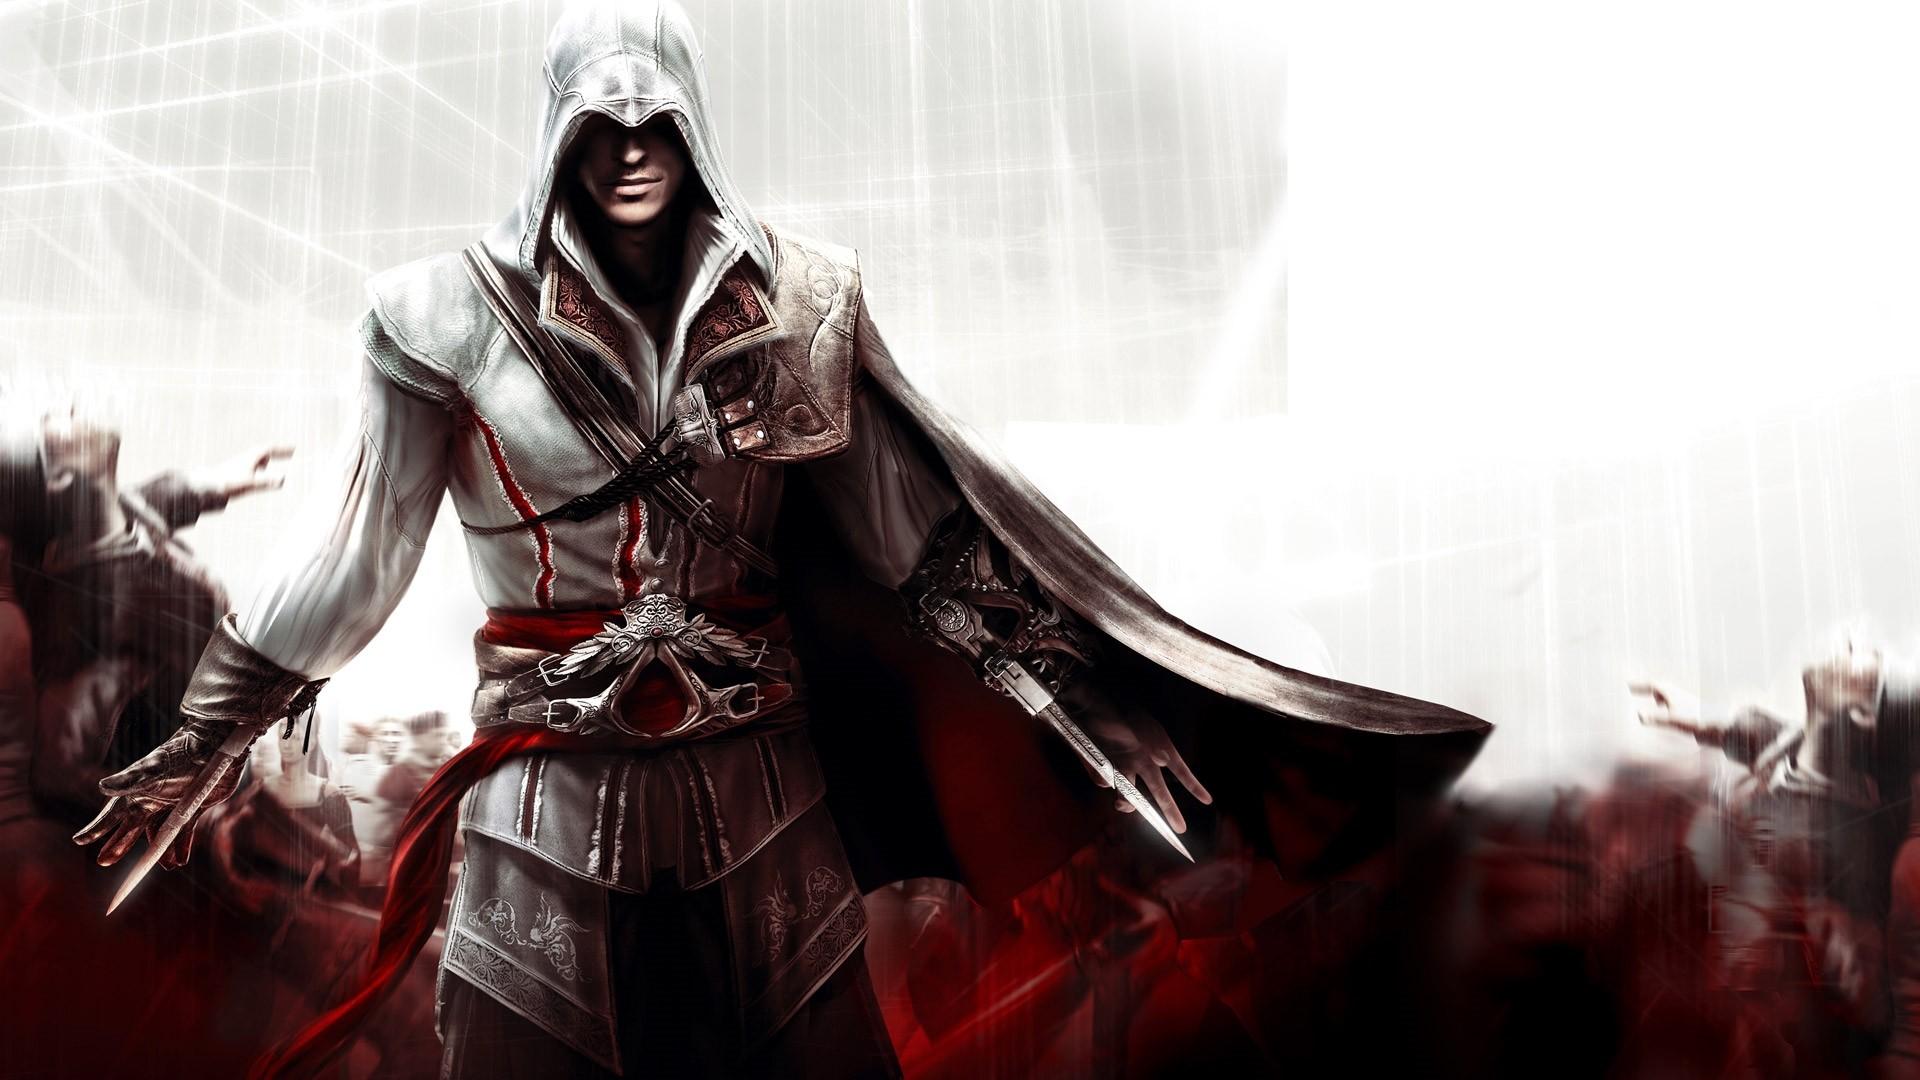 Assassin's Creed 2 Wallpaper HD